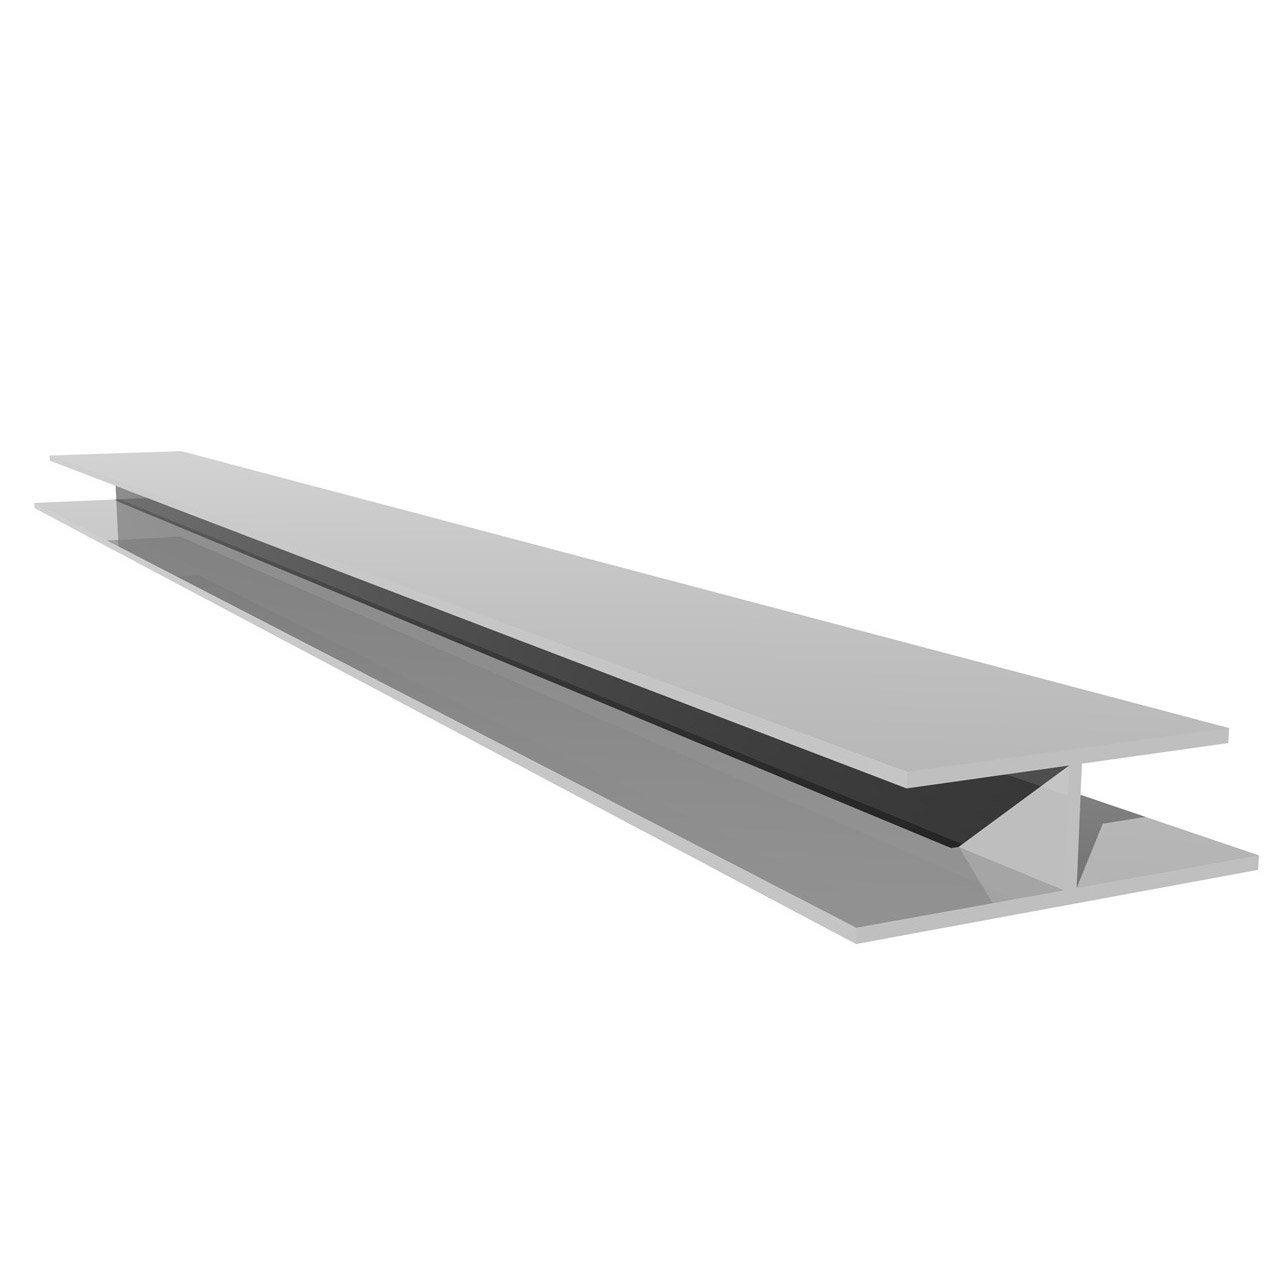 Profil de jonction h blanc pvc l 3 m leroy merlin - Plat aluminium leroy merlin ...